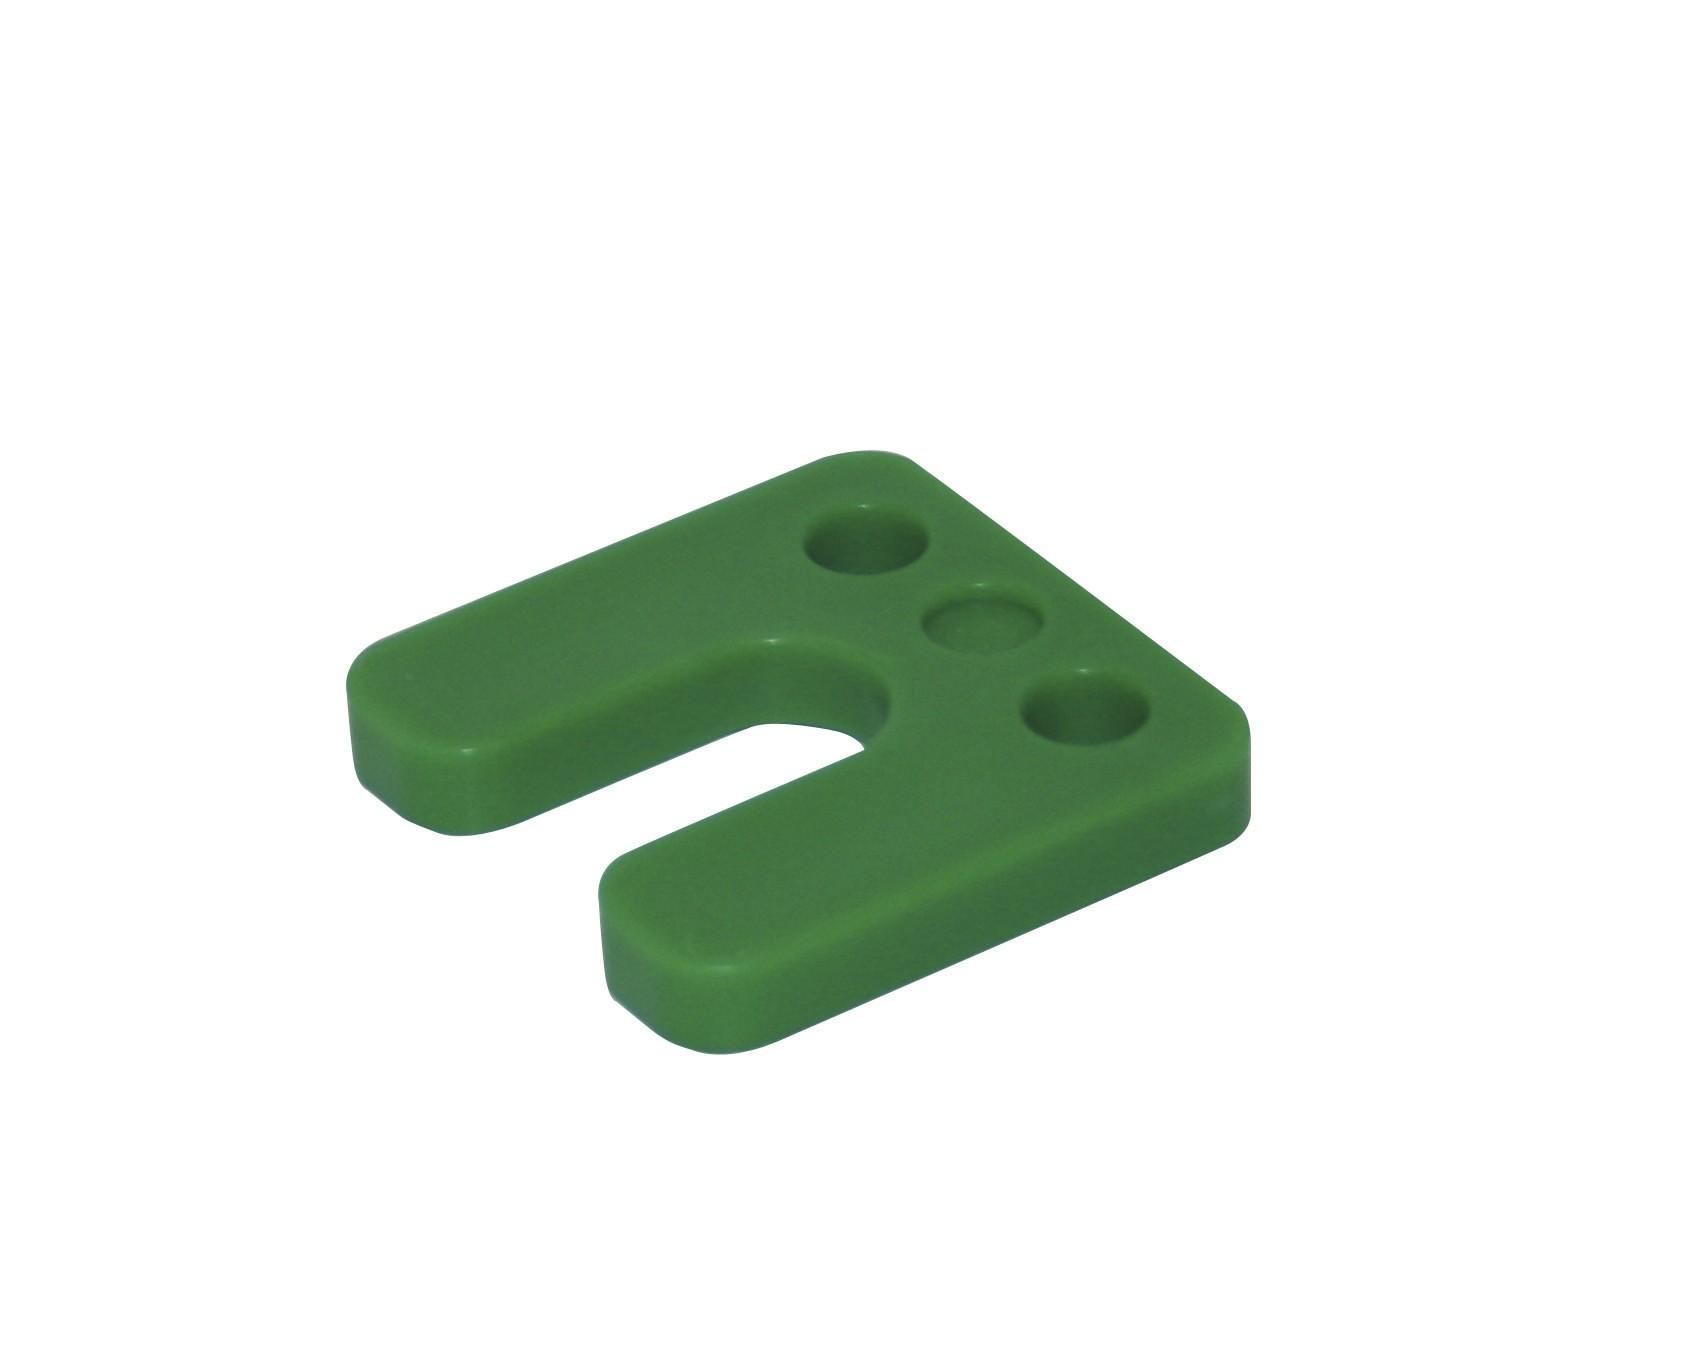 Drukplaat met sleuf groen 10 70x70 KS